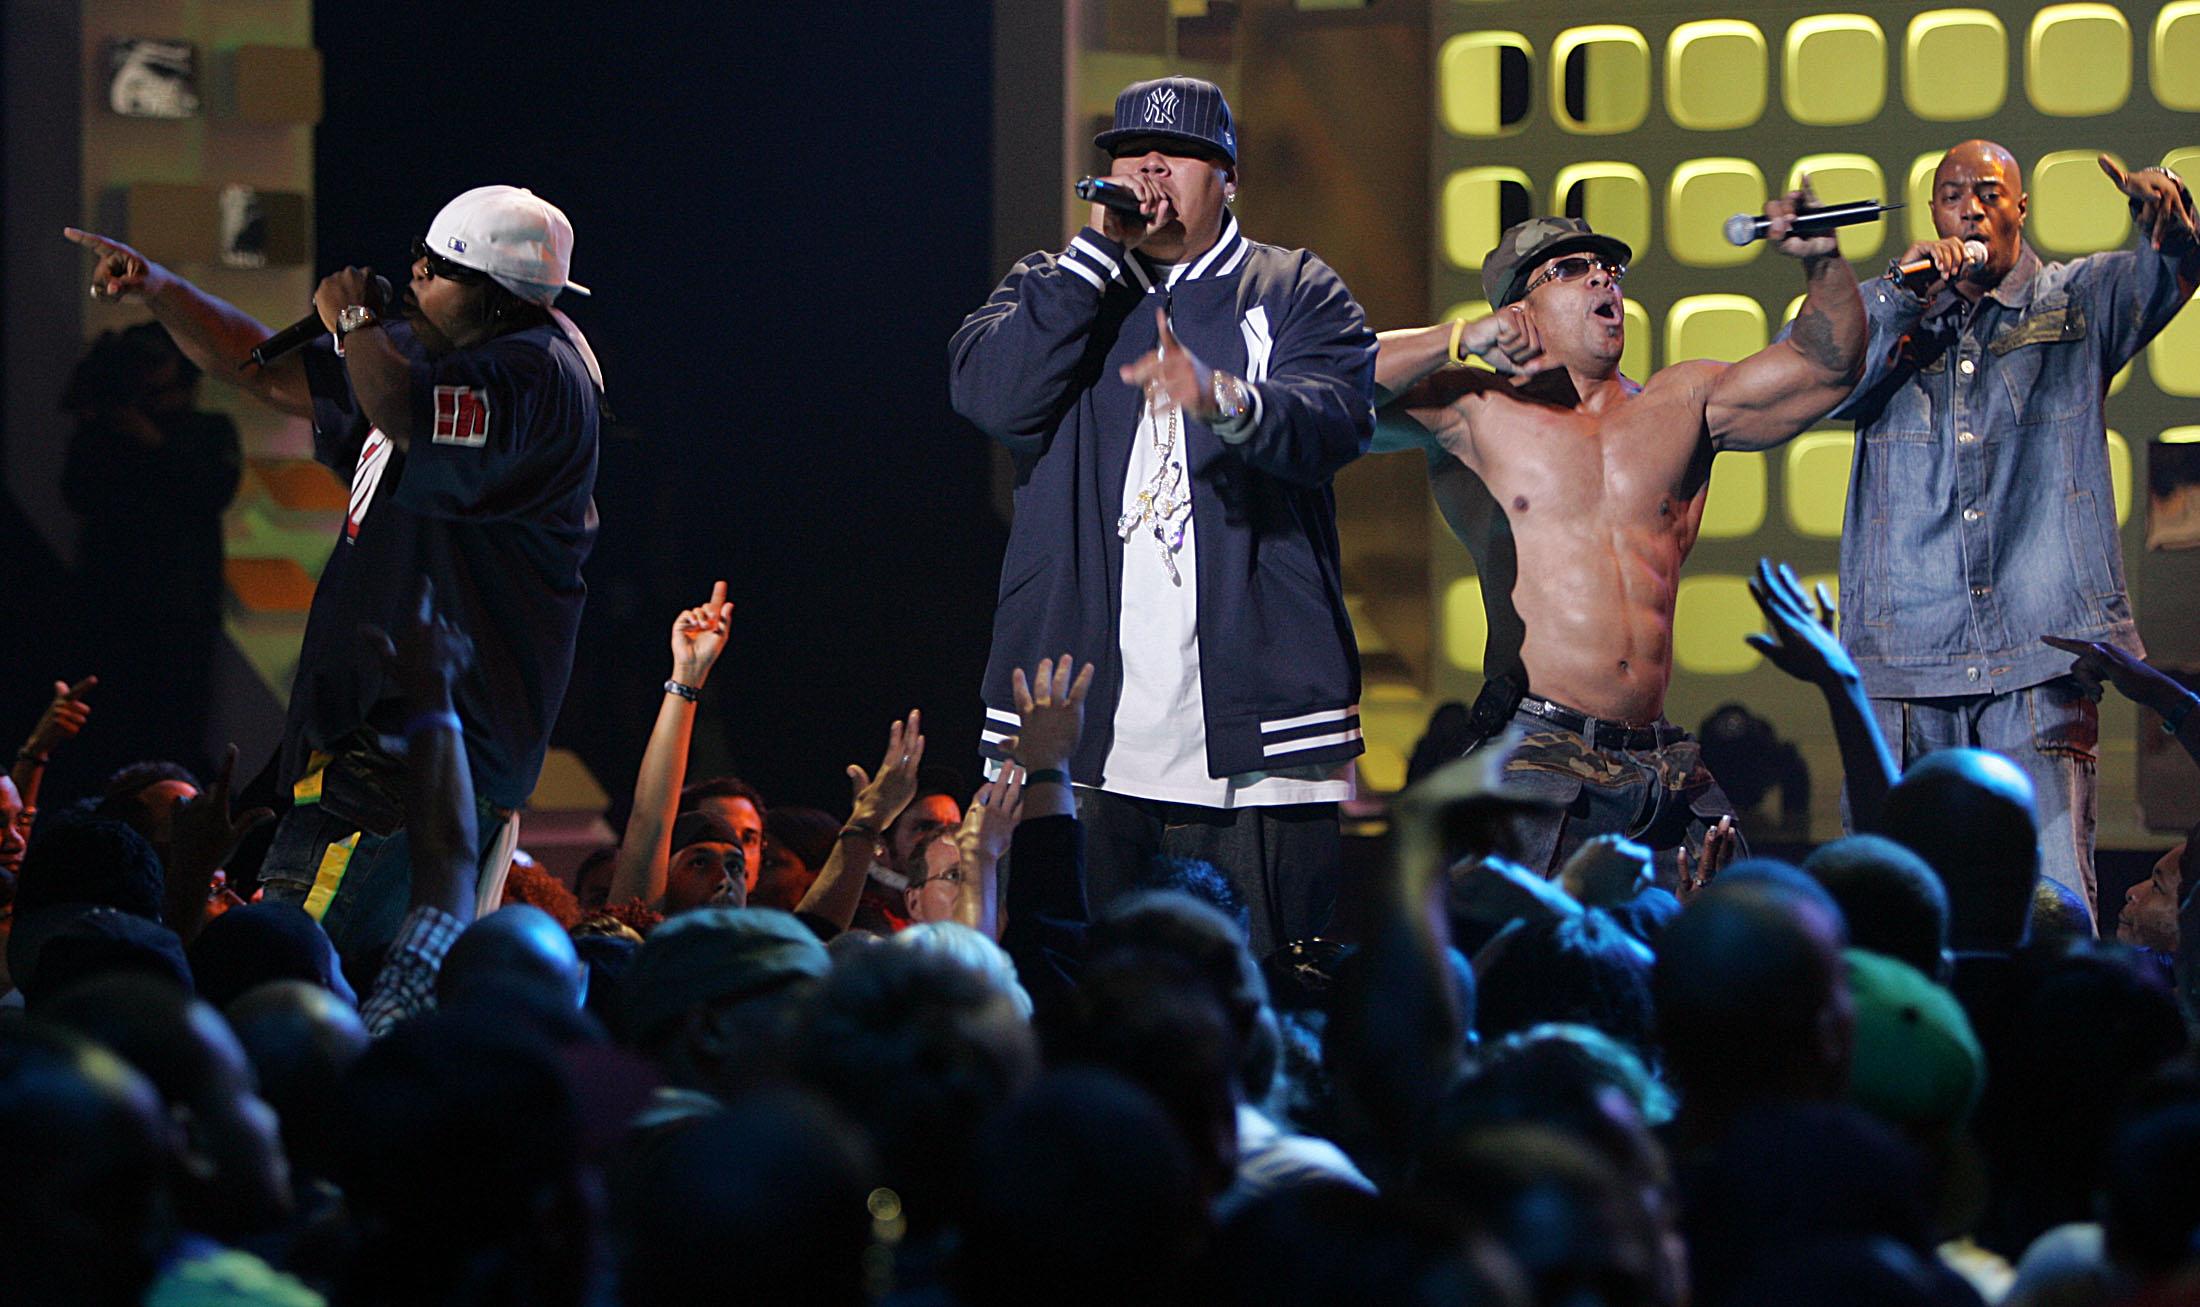 Fat Joe nastupa s Grandmaster Flash and The Furious Five tijekom VH1 Hip Hop Honors u New Yorku